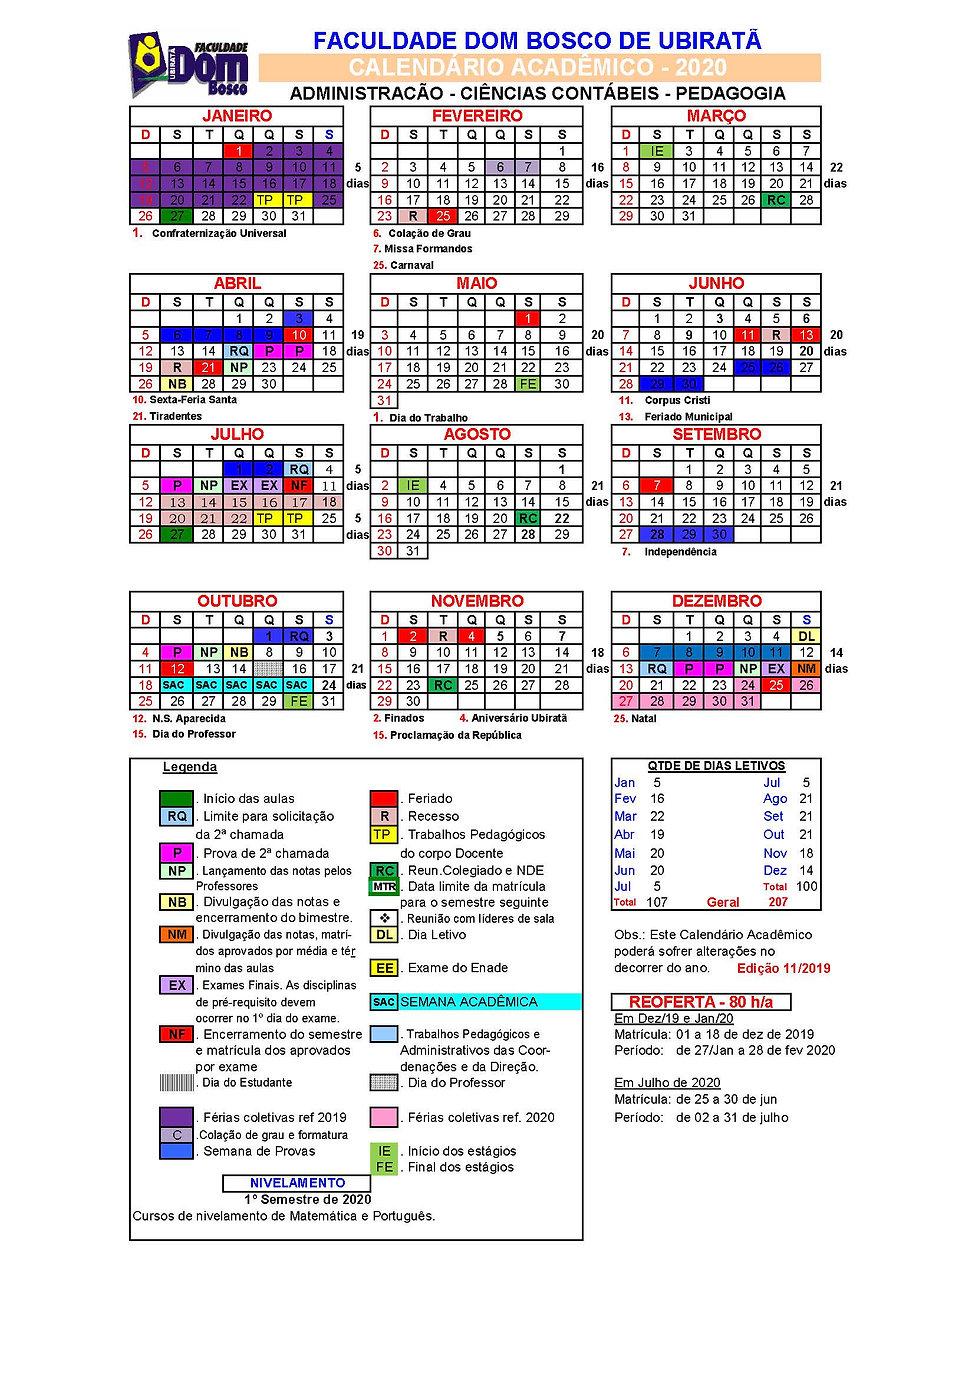 Calendario Academico 2020 Ubirata_ed 25_